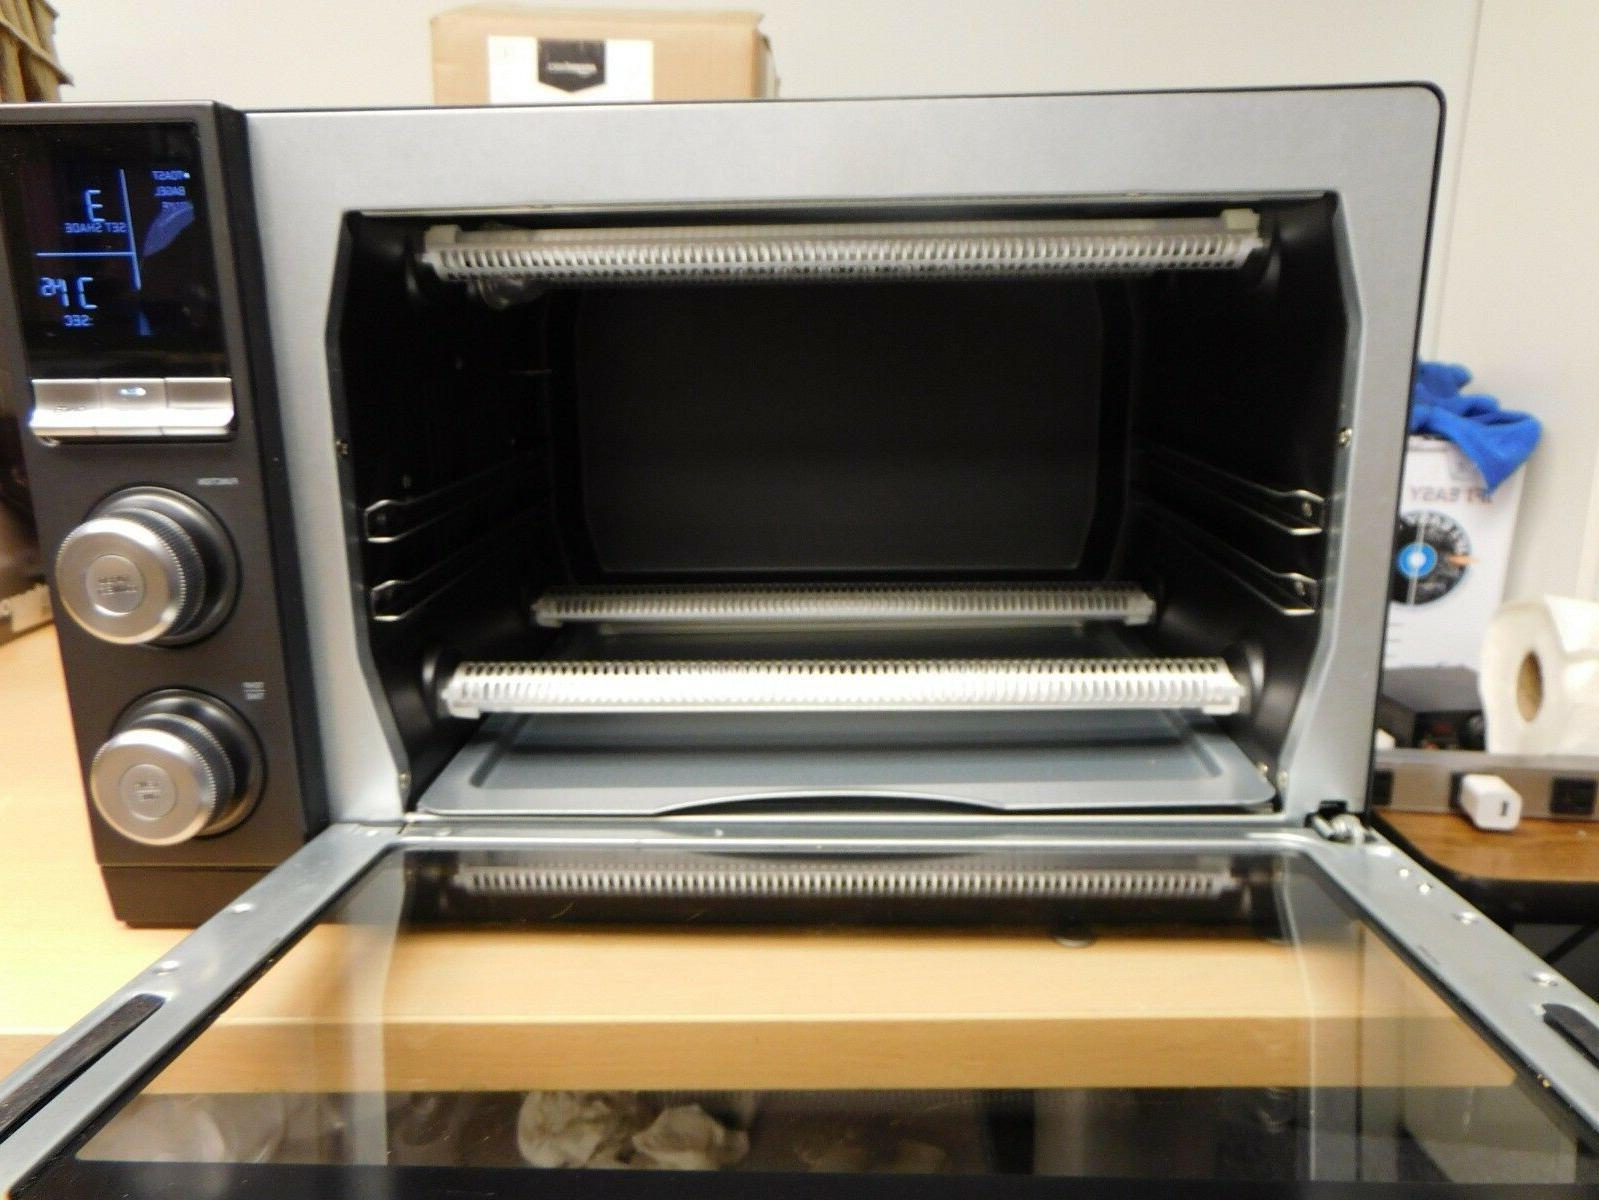 Calphalon Toaster Oven Brand New Broken